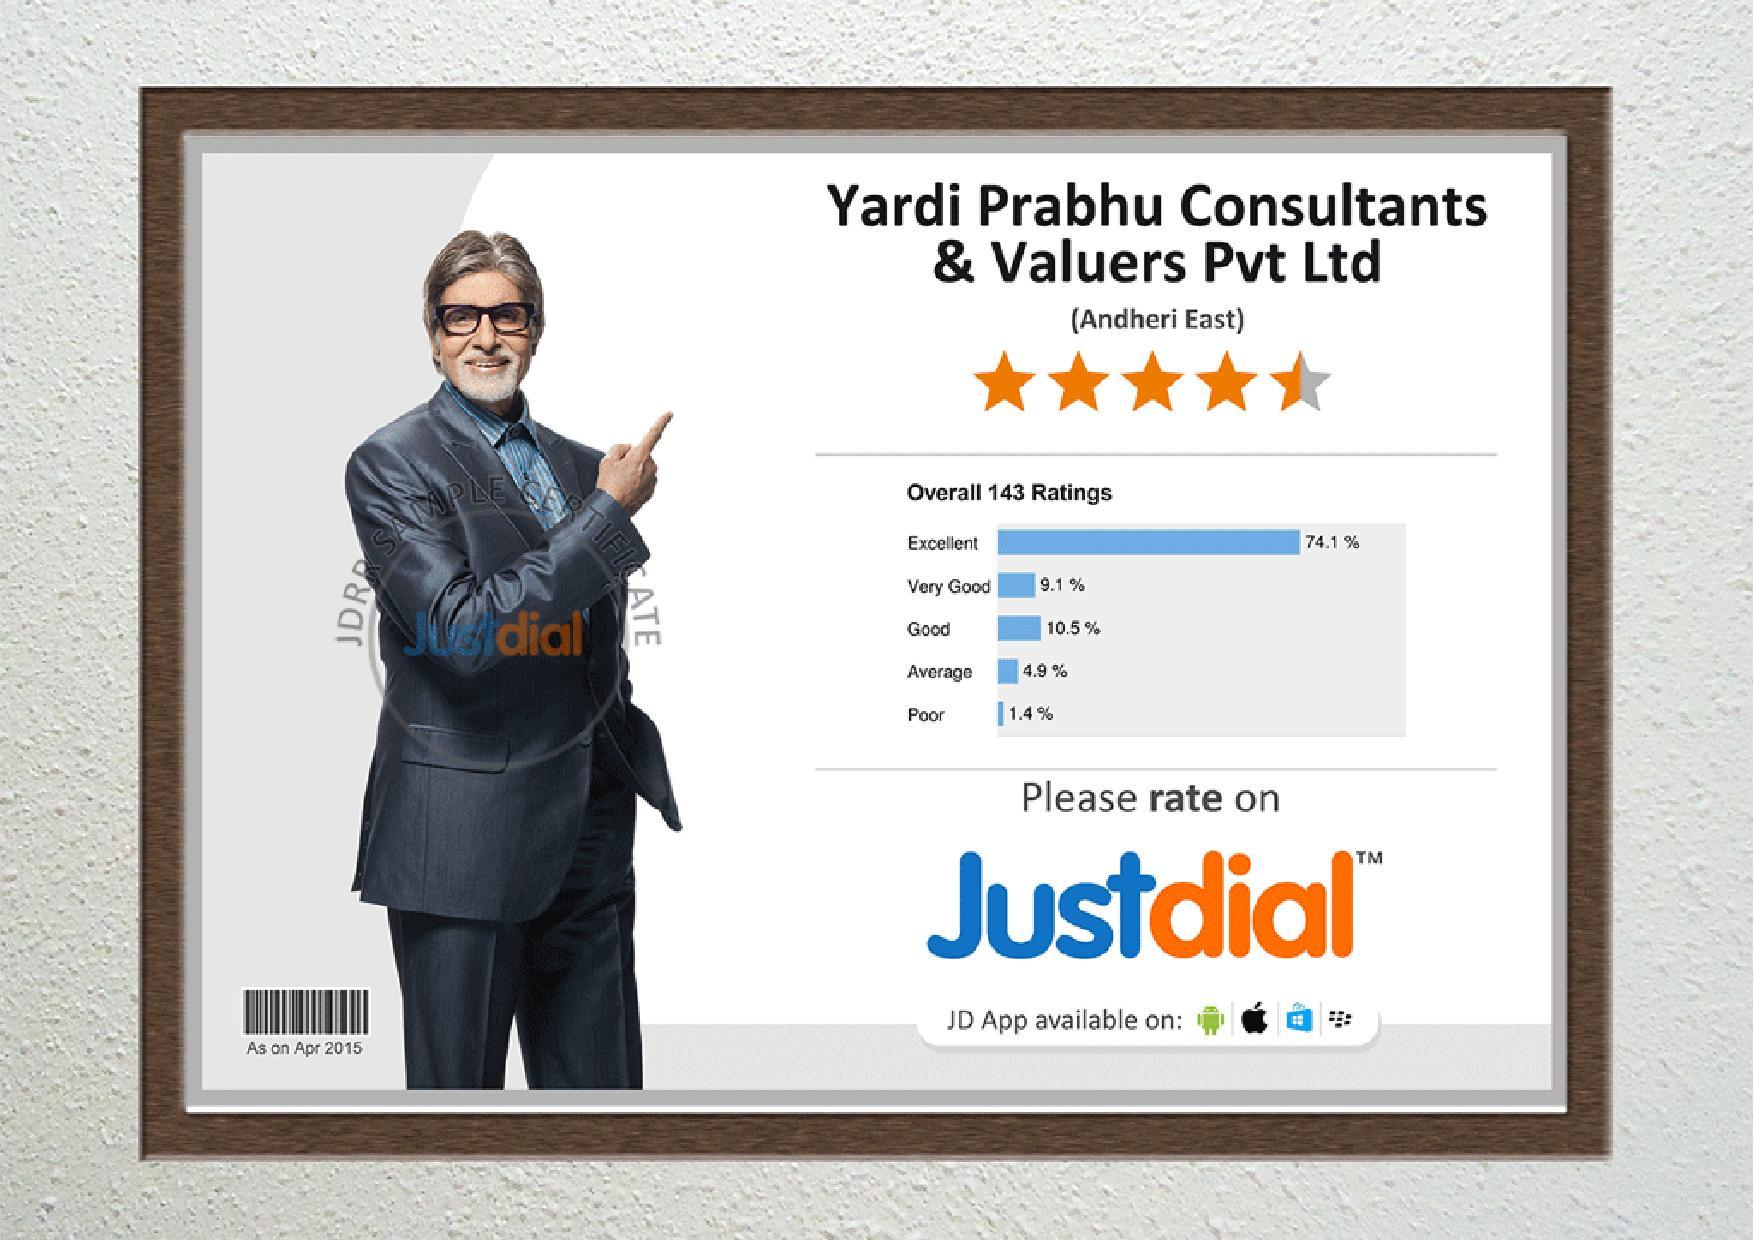 Clients - Yardi Prabhu Consultants & Valuers Pvt  Ltd